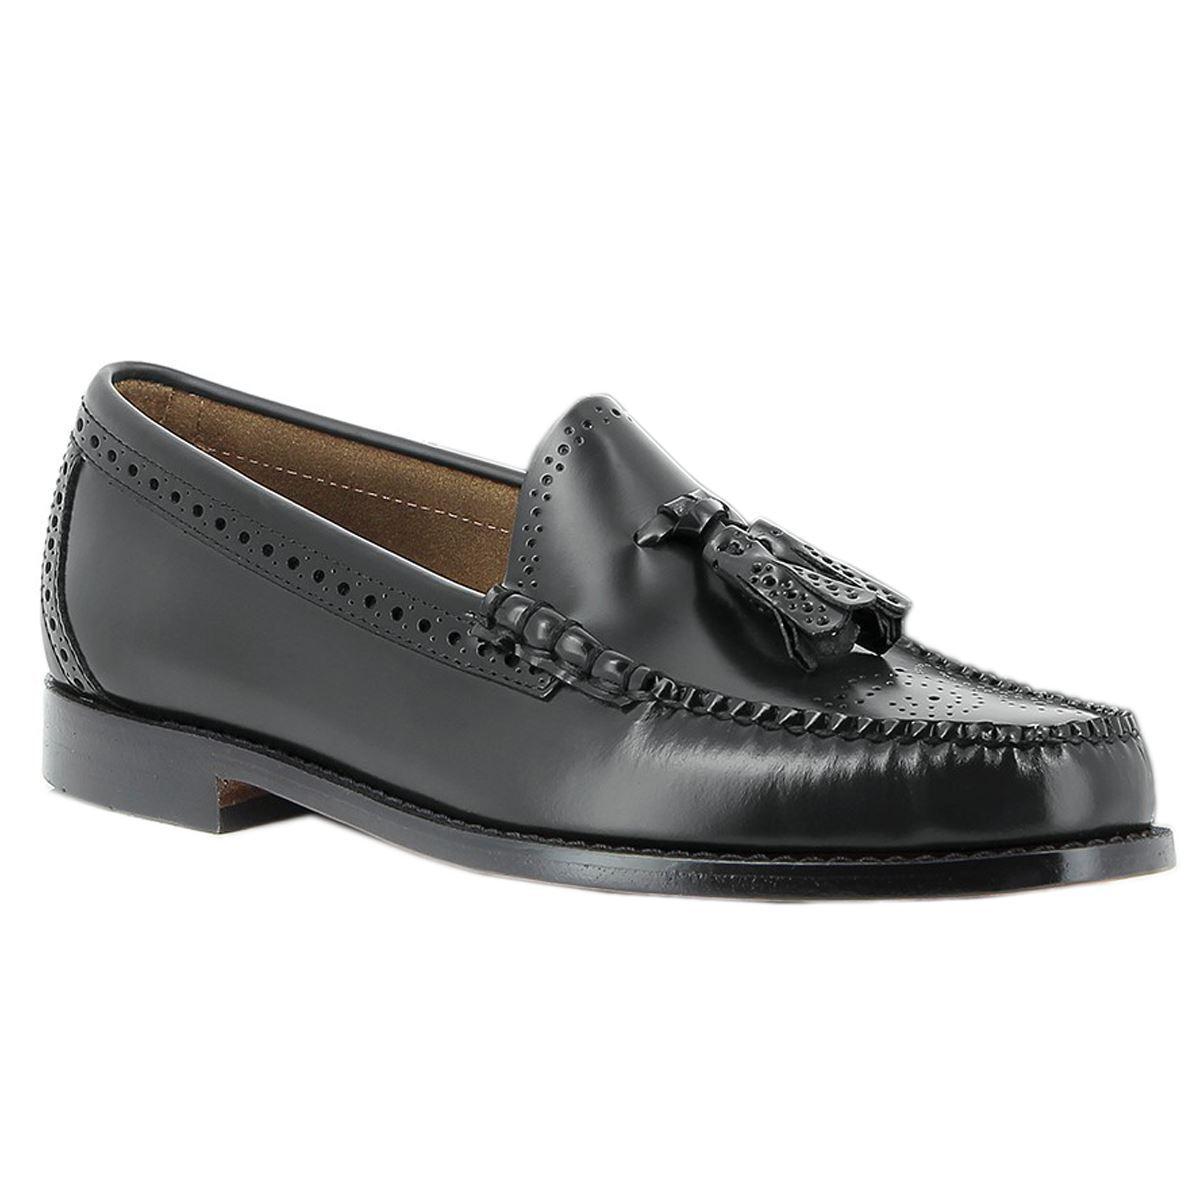 g.h. bass & co. larkin richelieu officiel hommes de chaussures en cuir hommes officiel noirs 952996